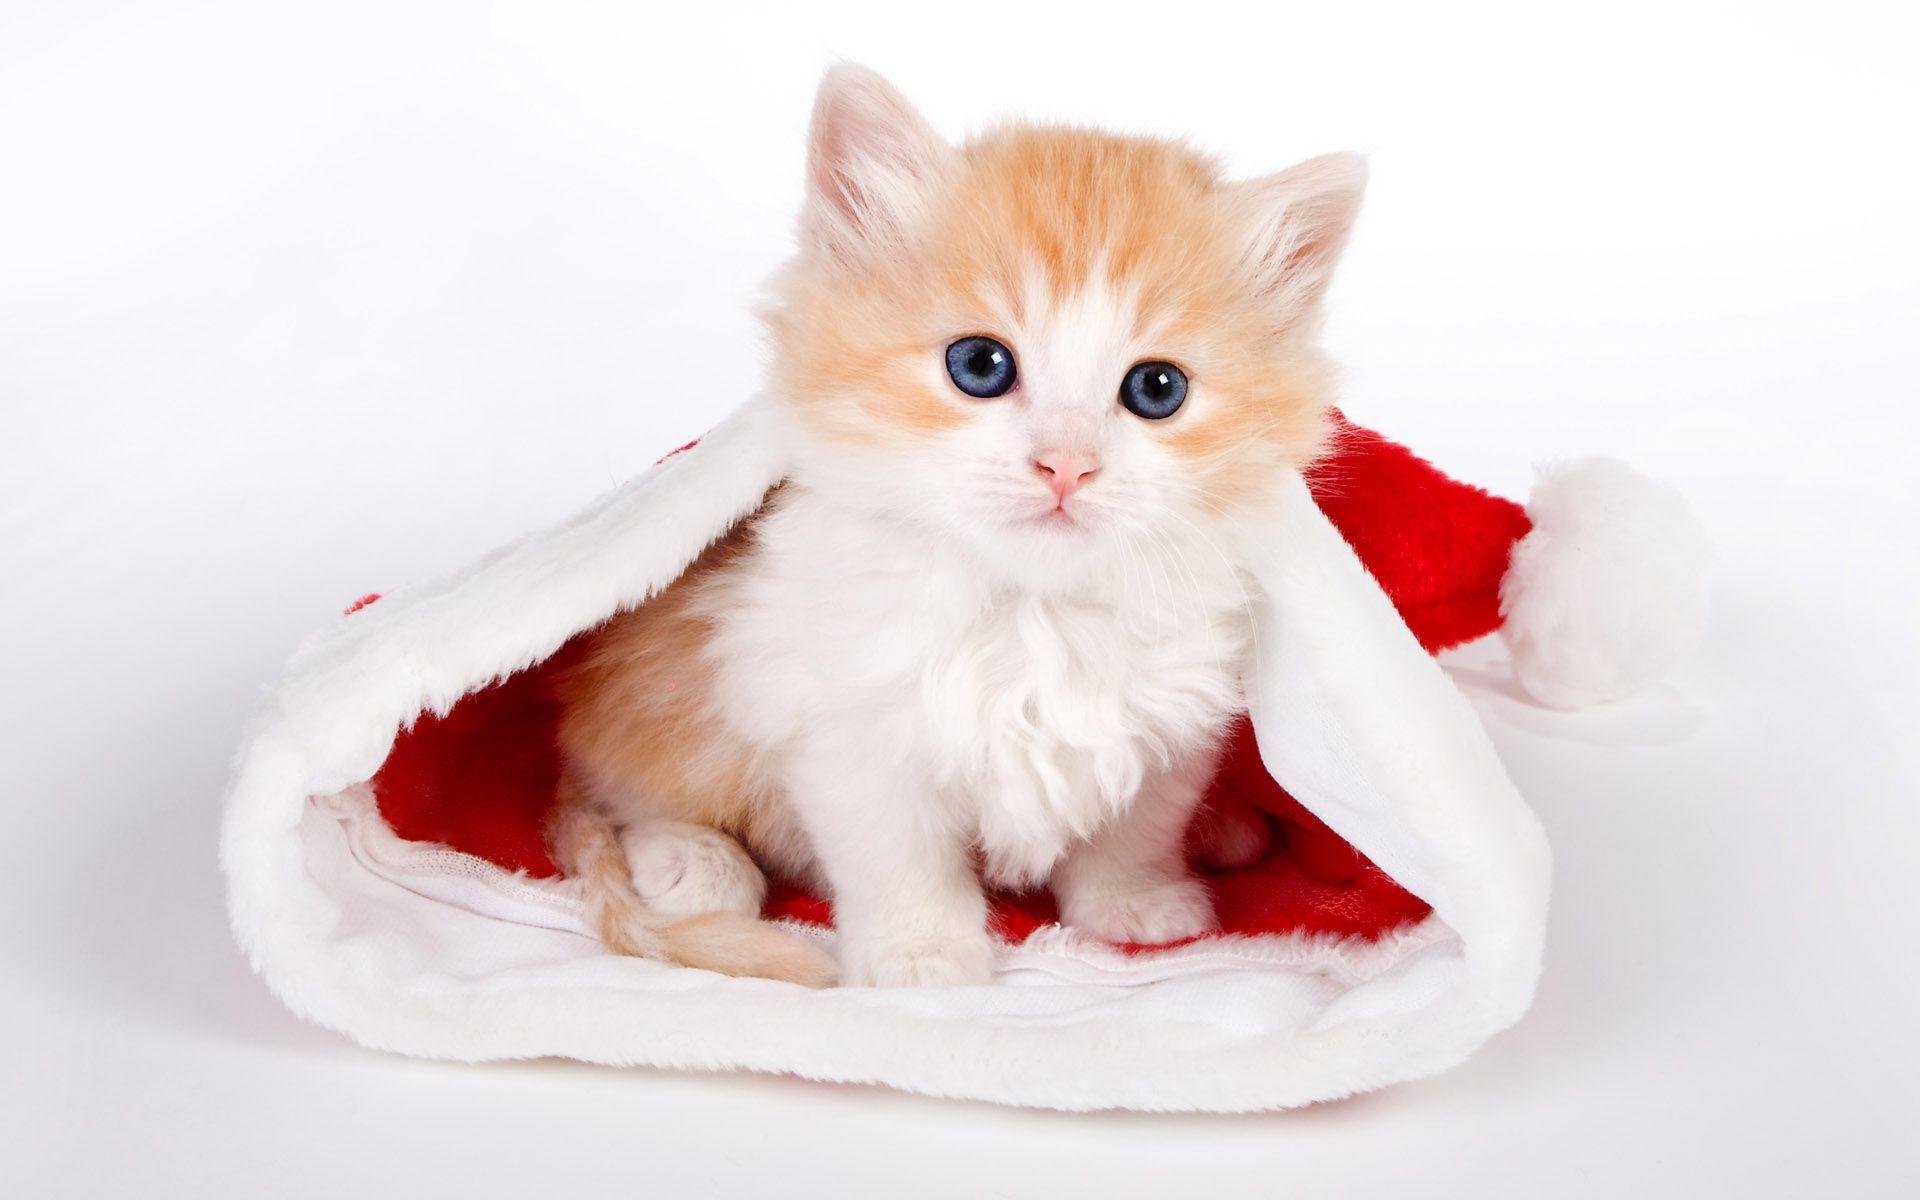 Wallpaper download cute - Cute Cat Background Hd Wallpaper For Desktop Beraplan